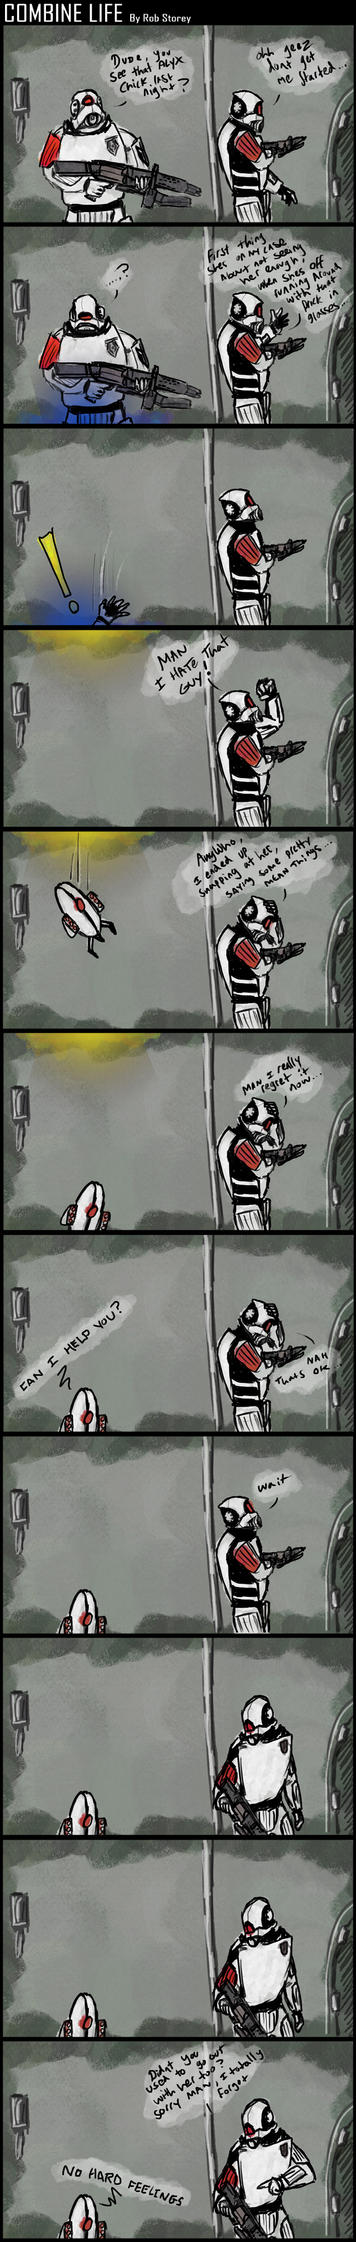 Half Life Comic by Silverhertz